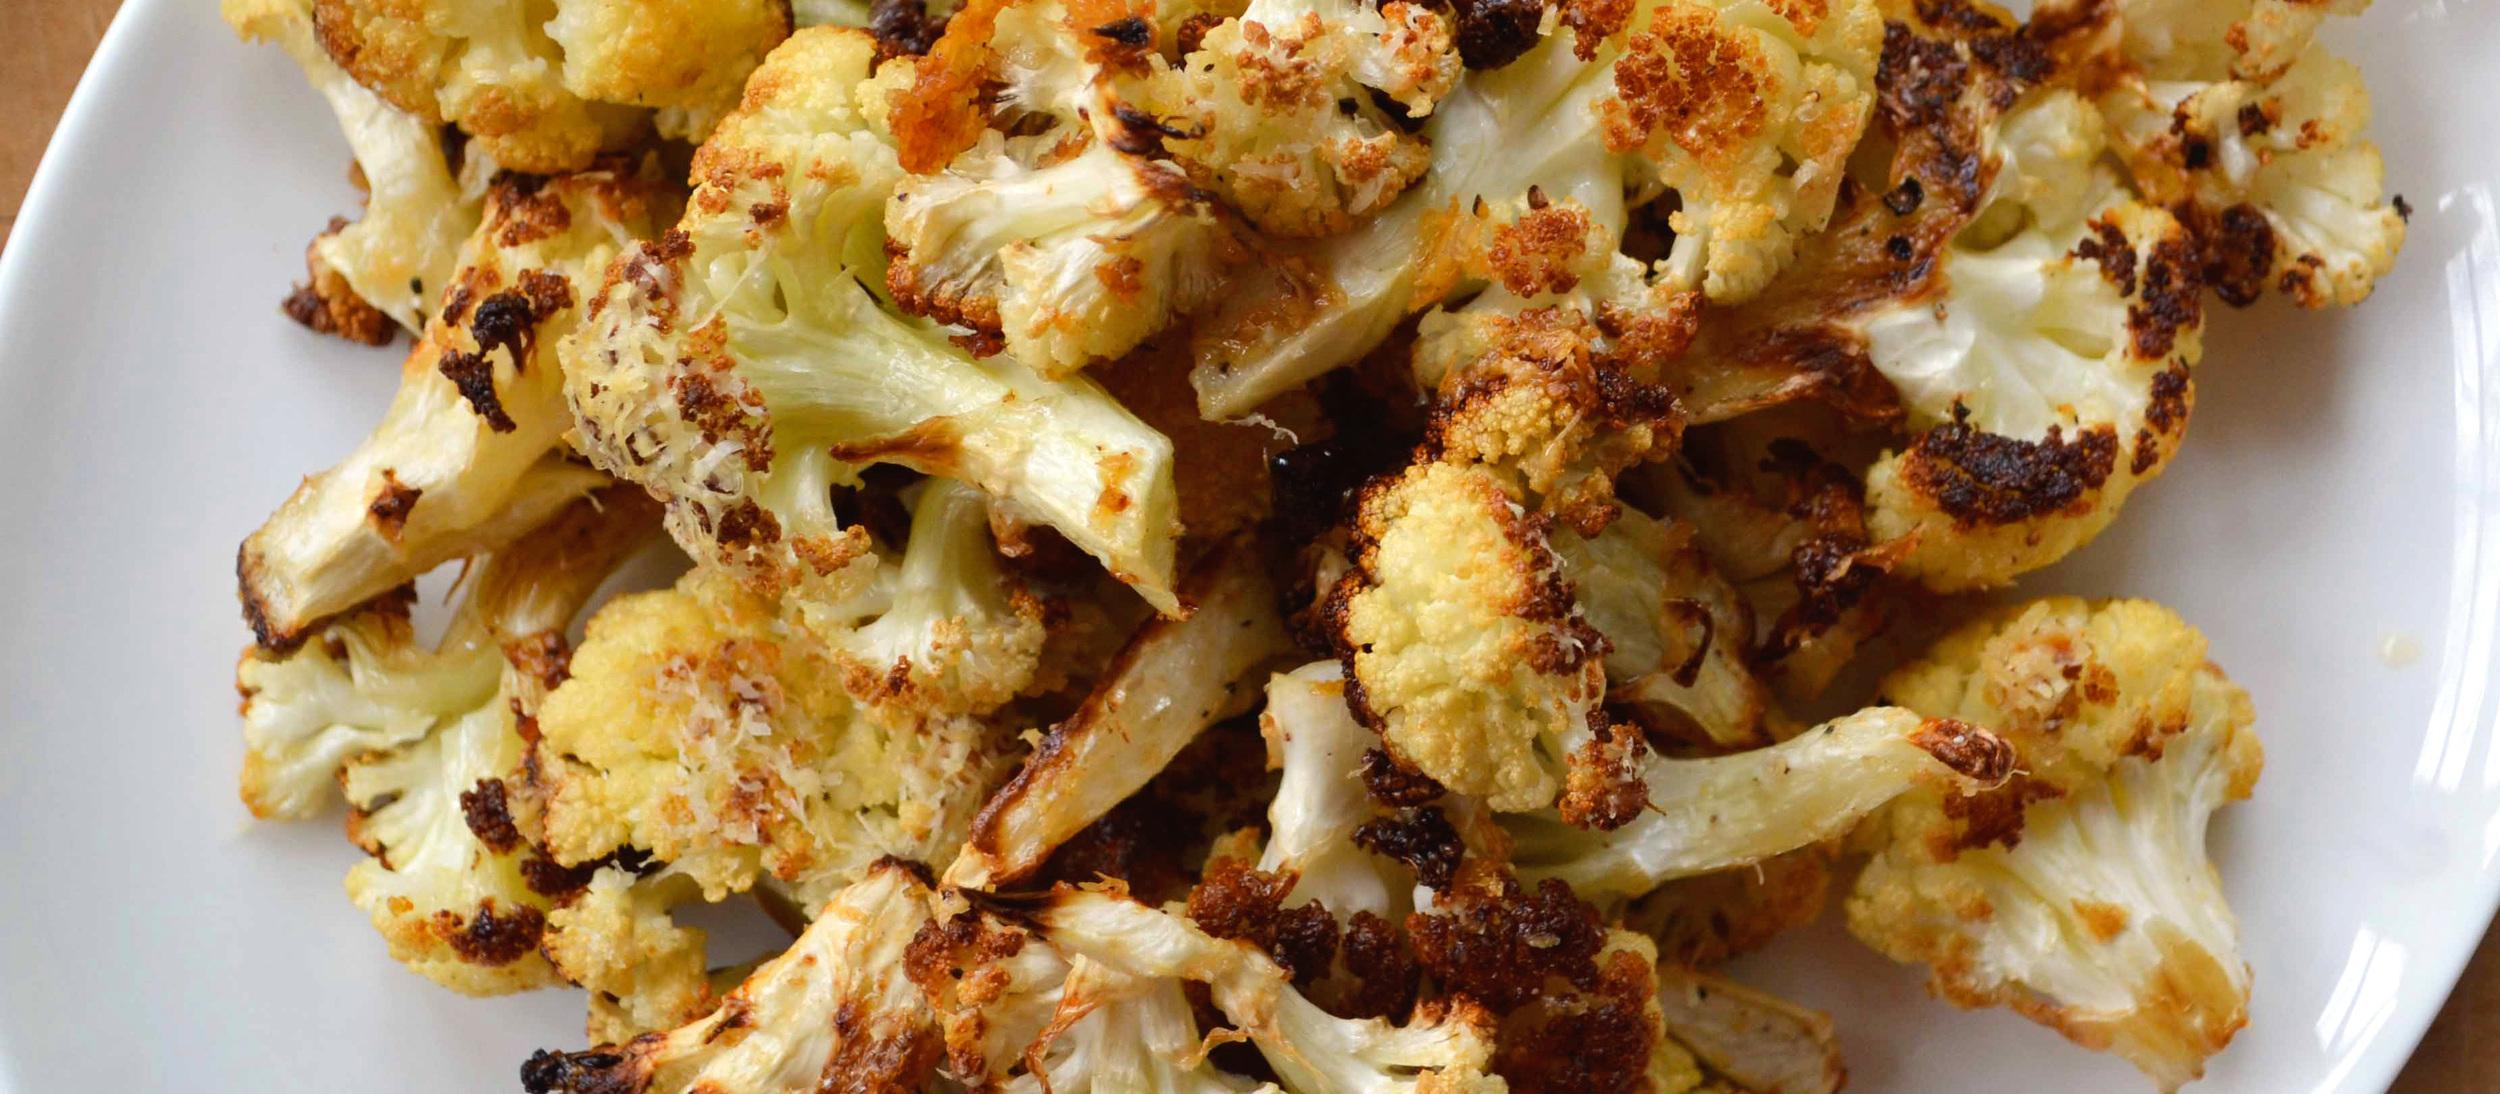 Smoky-Roasted-Cauliflower-230x230.jpg